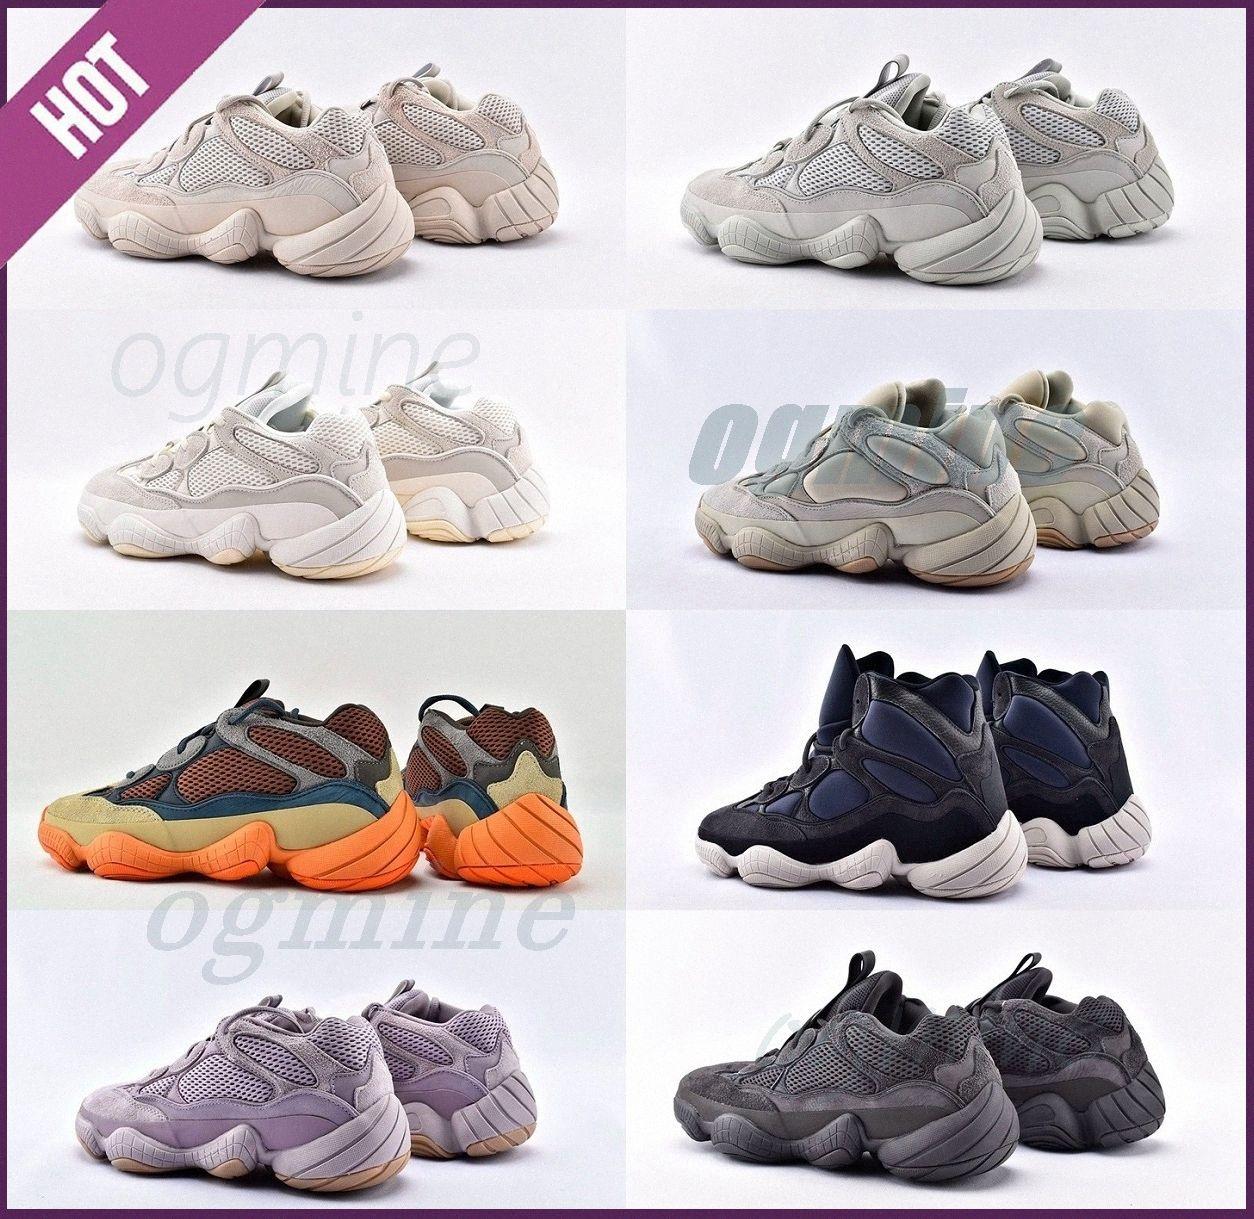 yeezy yeezys yezzy yeezys yzy enfant boost Kanye ouest 500 dessert rat roming chaussures d'os utilitaire blanc pierre noire Vision douce Vision Sports Sneakers rougis Jaune Bottes